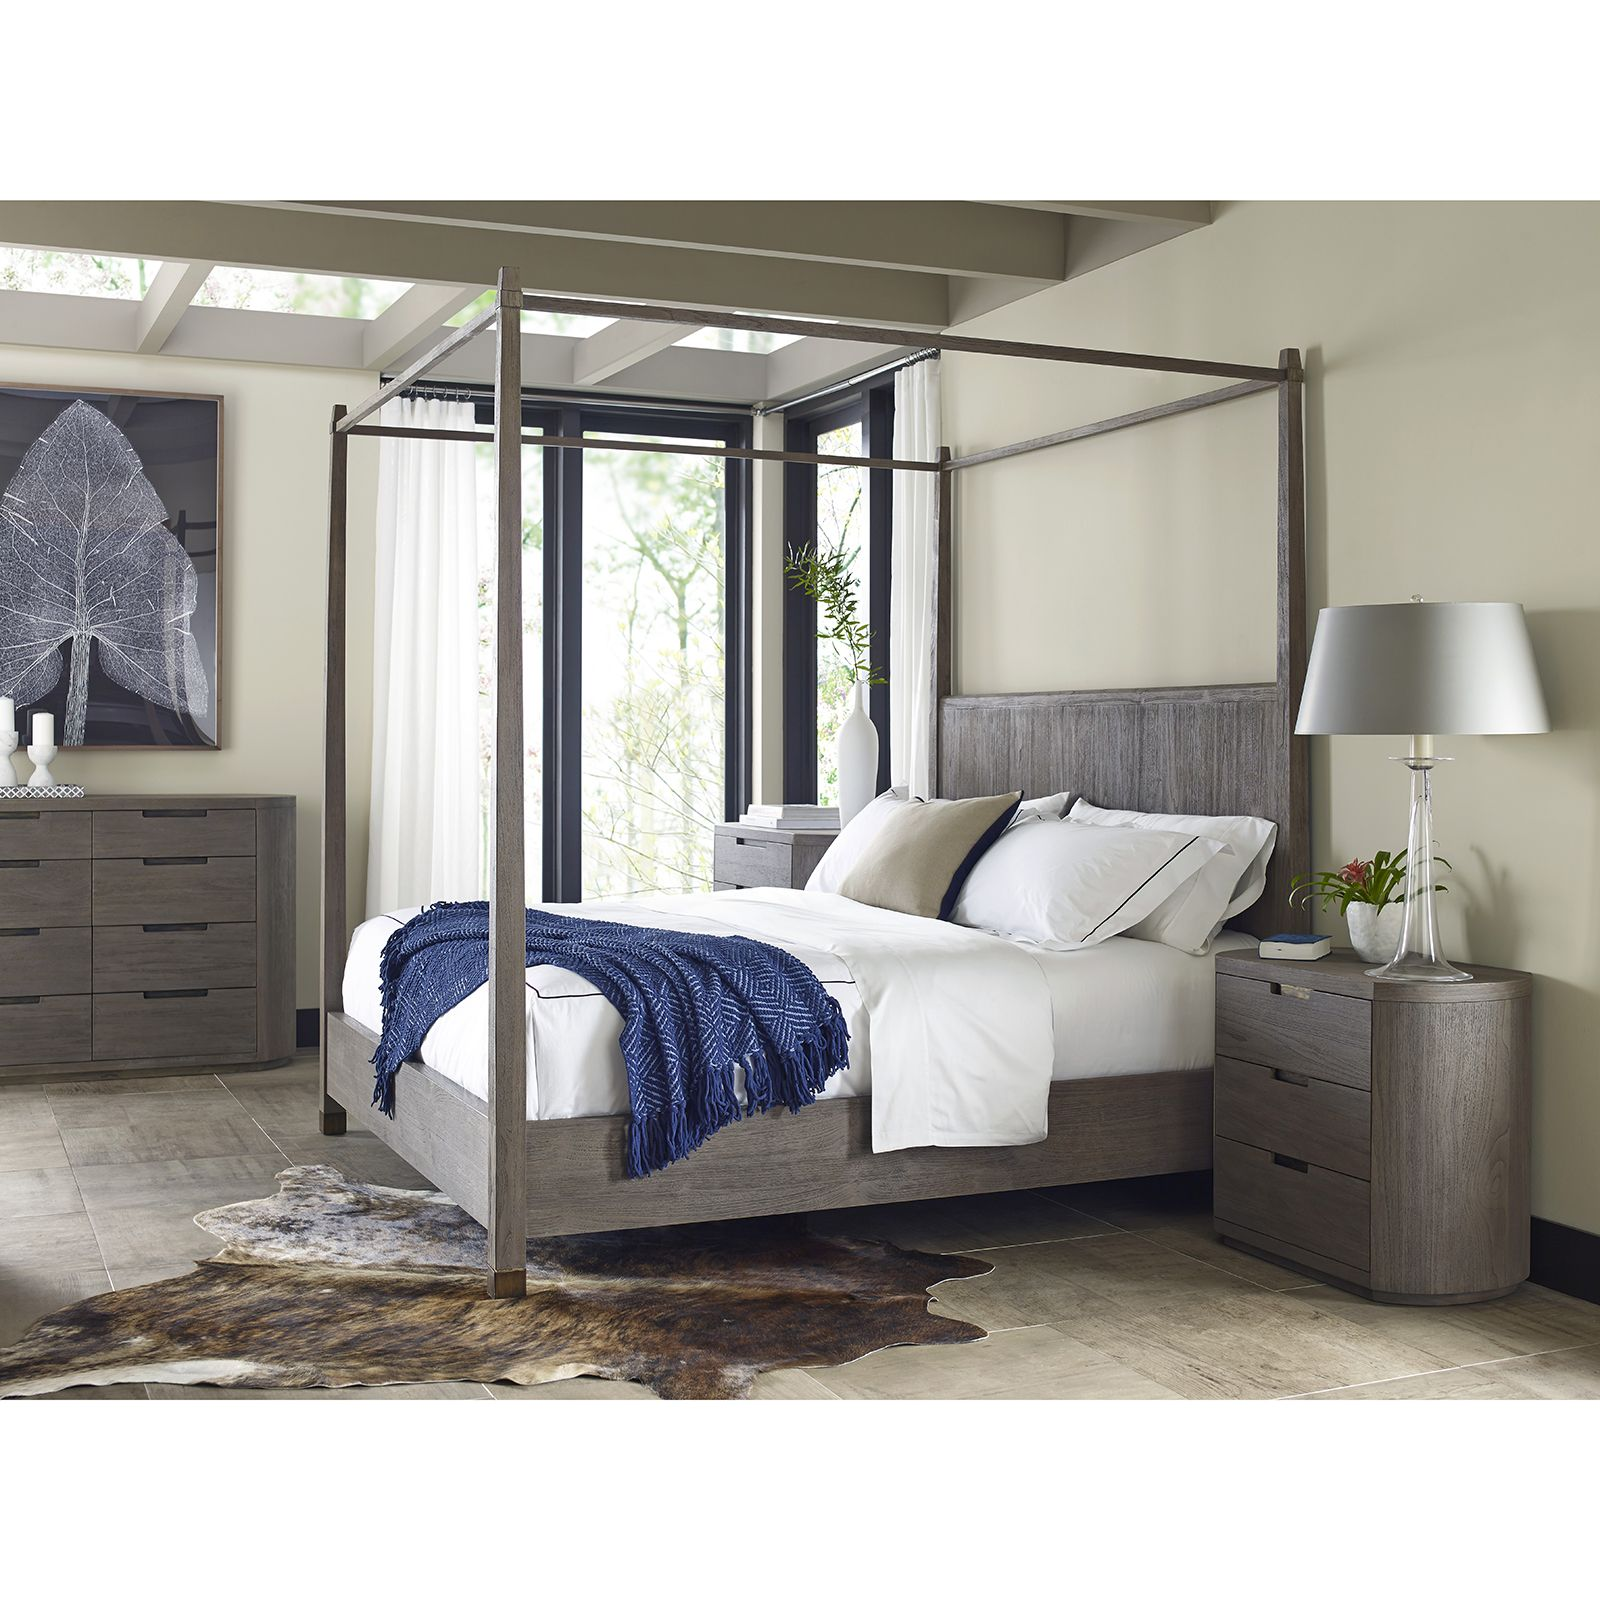 silver bed canopy on Alba Rustic Coastal Sand Teak Wood Canopy Bed King Wood Canopy Bed Furniture Bedroom Sets